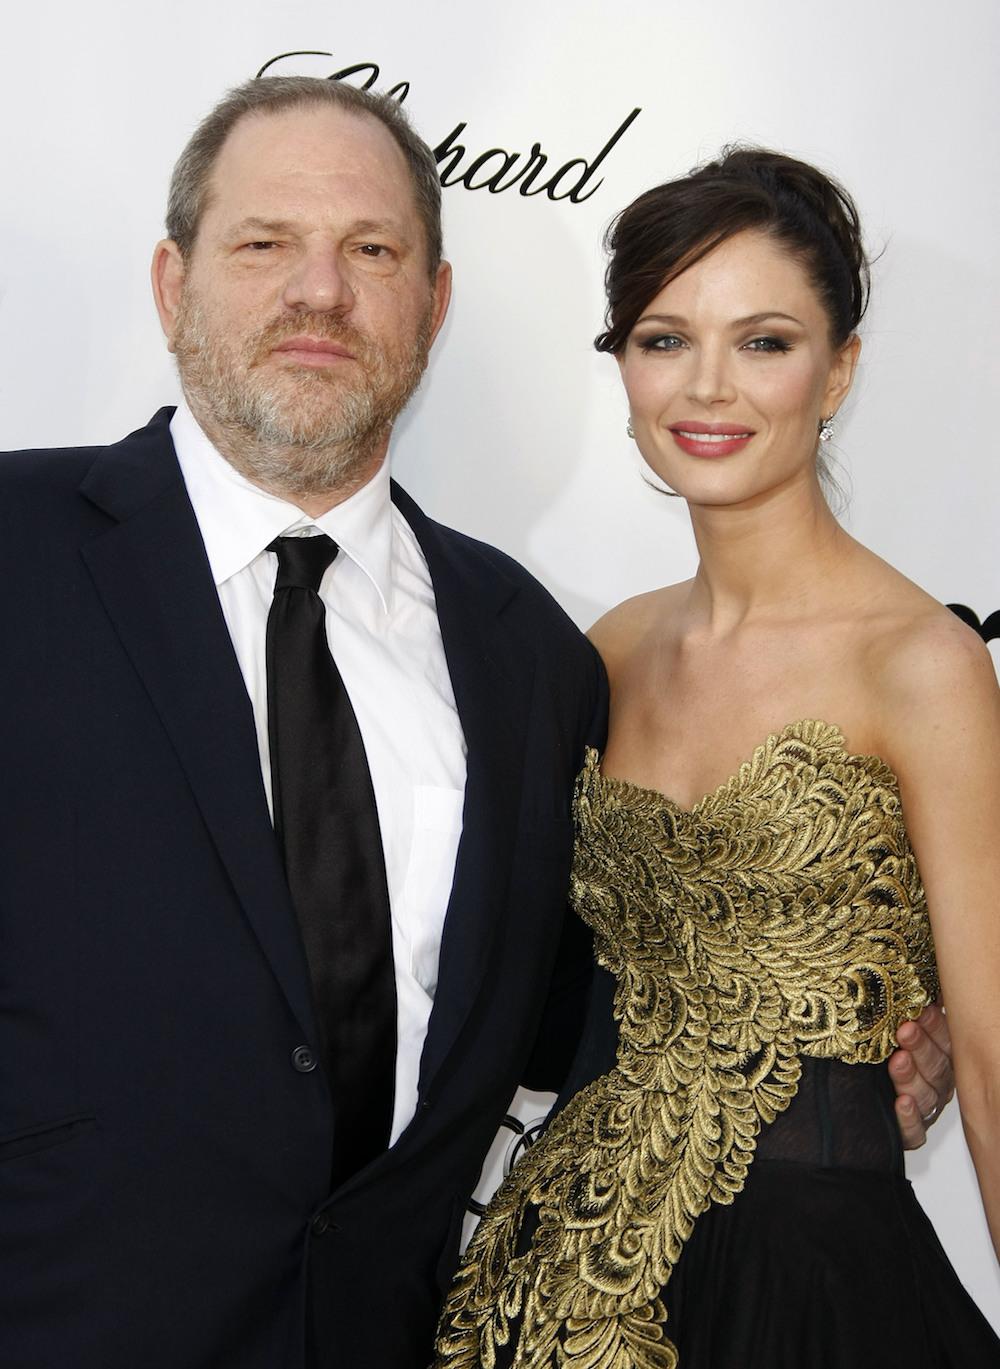 File Images :Georgina Chapman and Producer Harvey Weinstein <P> Pictured: Harvey Weinstein and Georgina Chapman <B>Ref: SPL1599205  111017  </B><BR /> Picture by: Splash News<BR /> </P><P> <B>Splash News and Pictures</B><BR /> Los Angeles:310-821-2666<BR /> New York:212-619-2666<BR /> London:870-934-2666<BR /> photodesk@splashnews.com<BR /> </P>